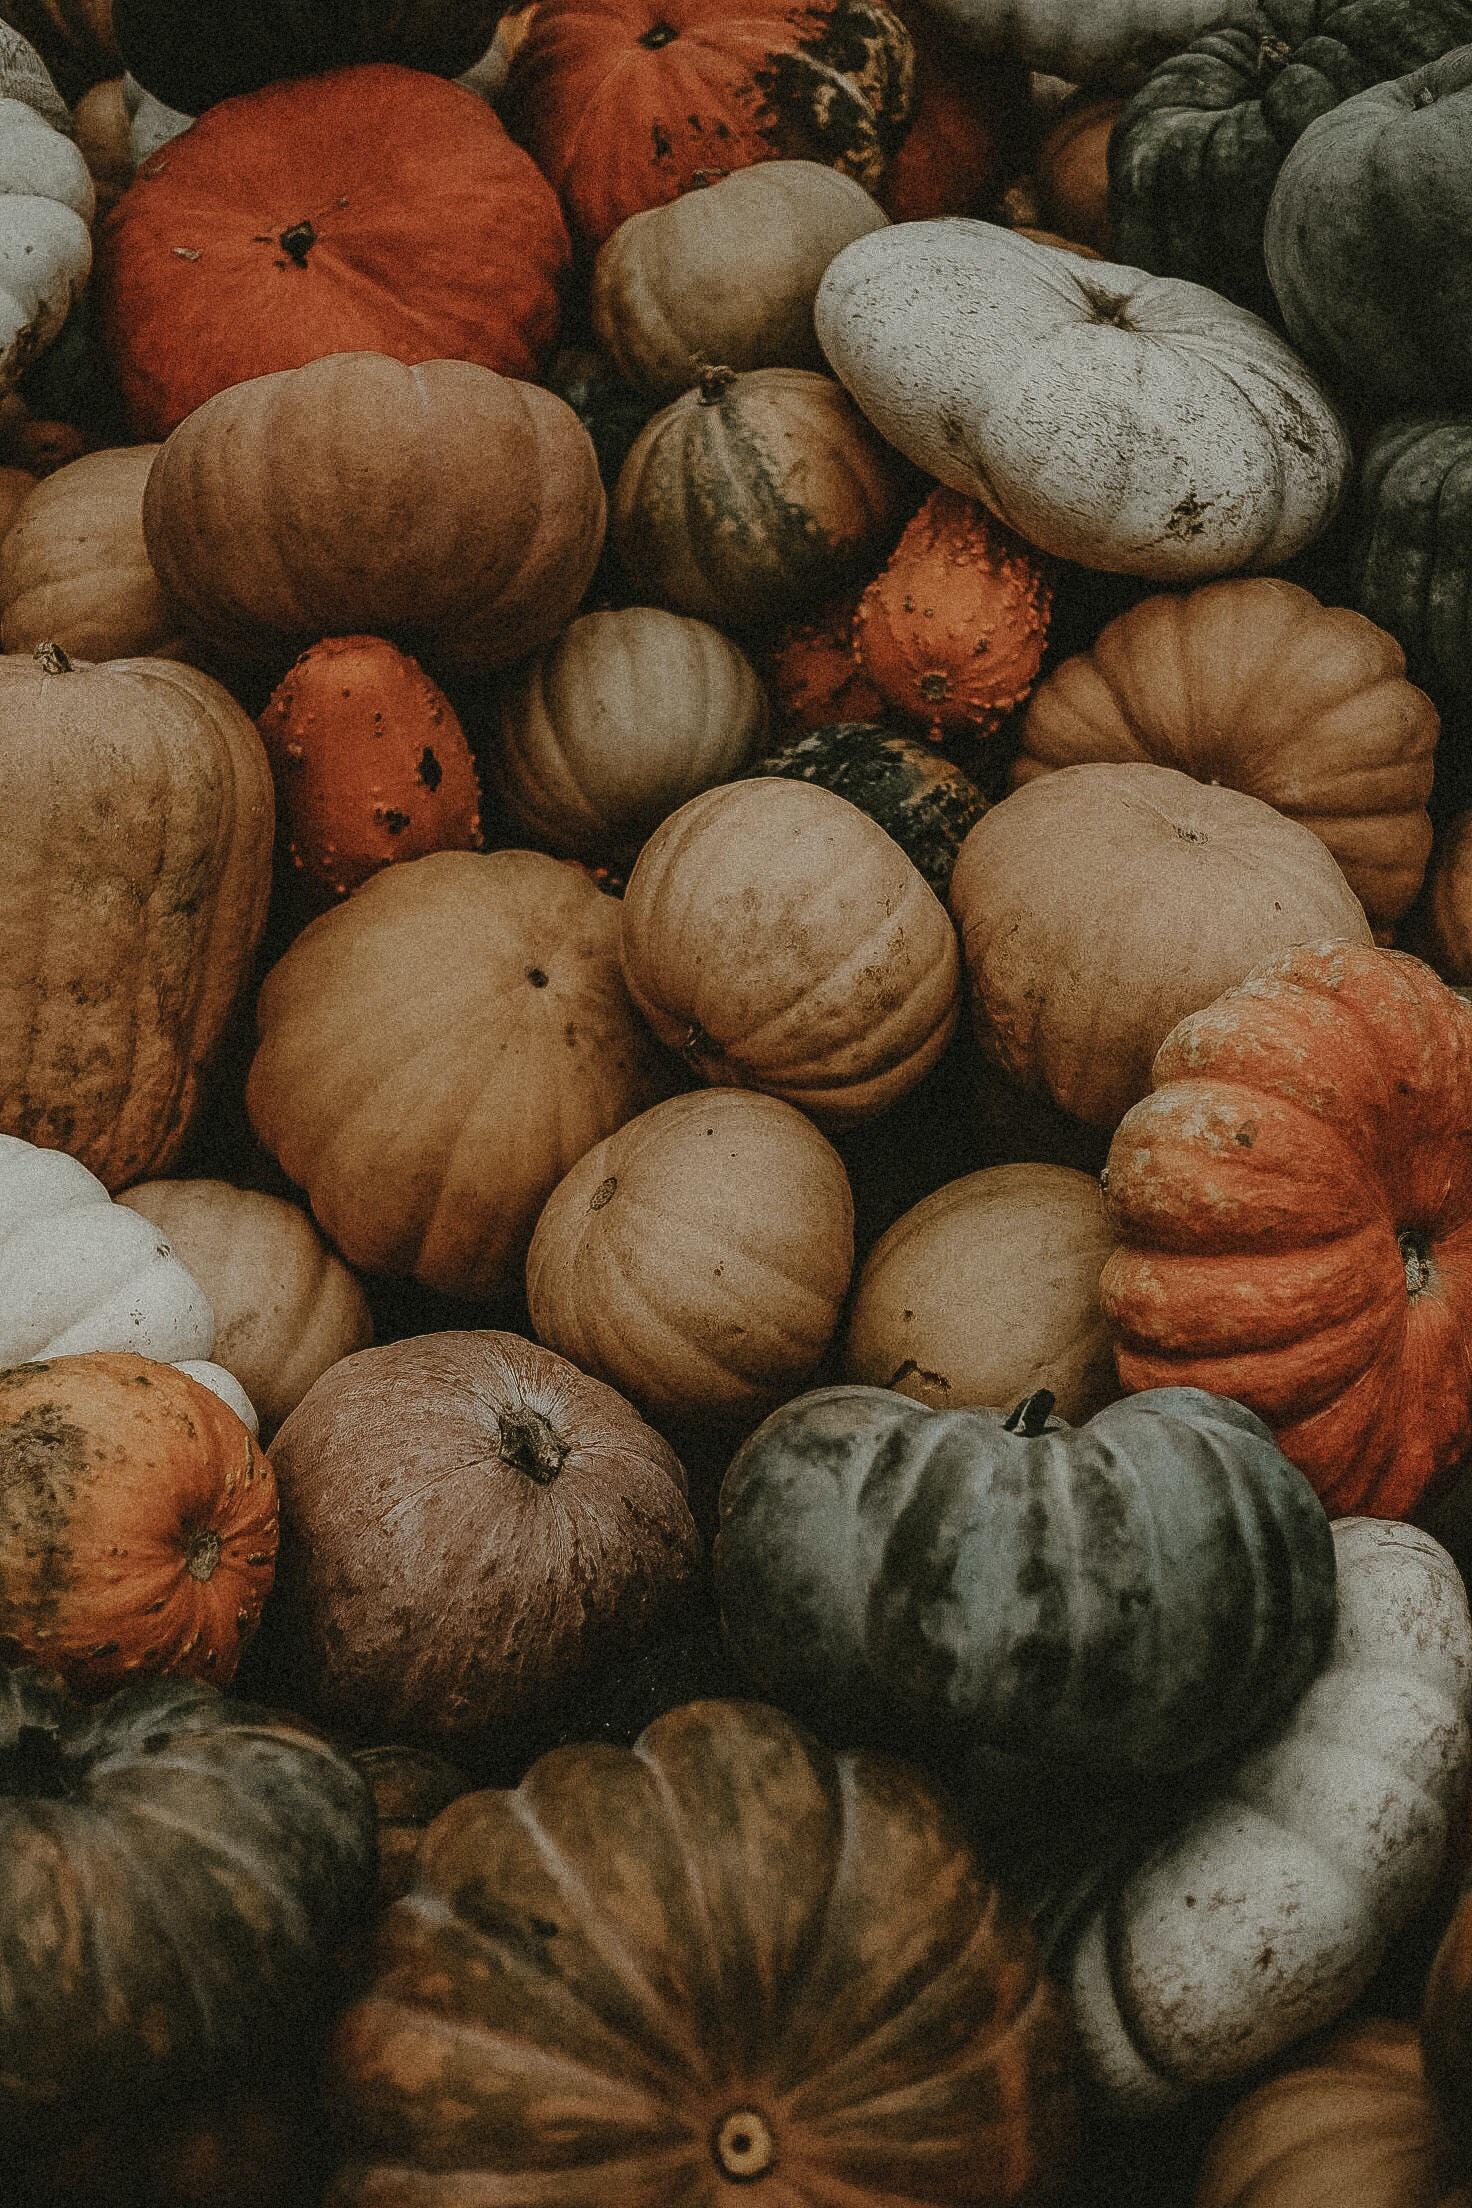 pile of assorted pumpkins